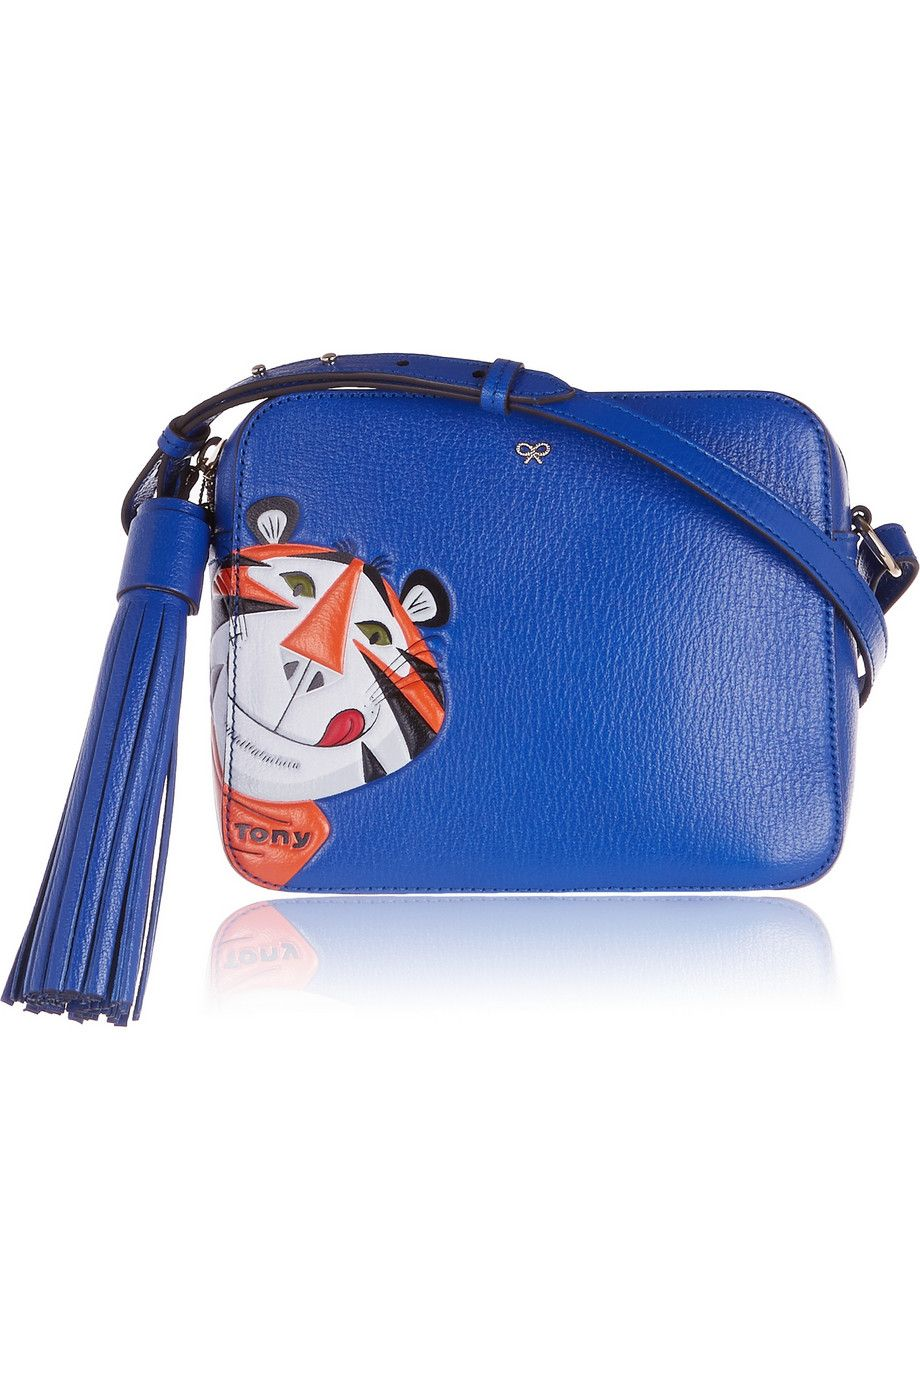 "<p>Anya Hindmarch Frosties Shoulder Bag, $1,195; <a href=""http://www.net-a-porter.com/us/en/product/551578"">net-a-porter.com</a> </p>"